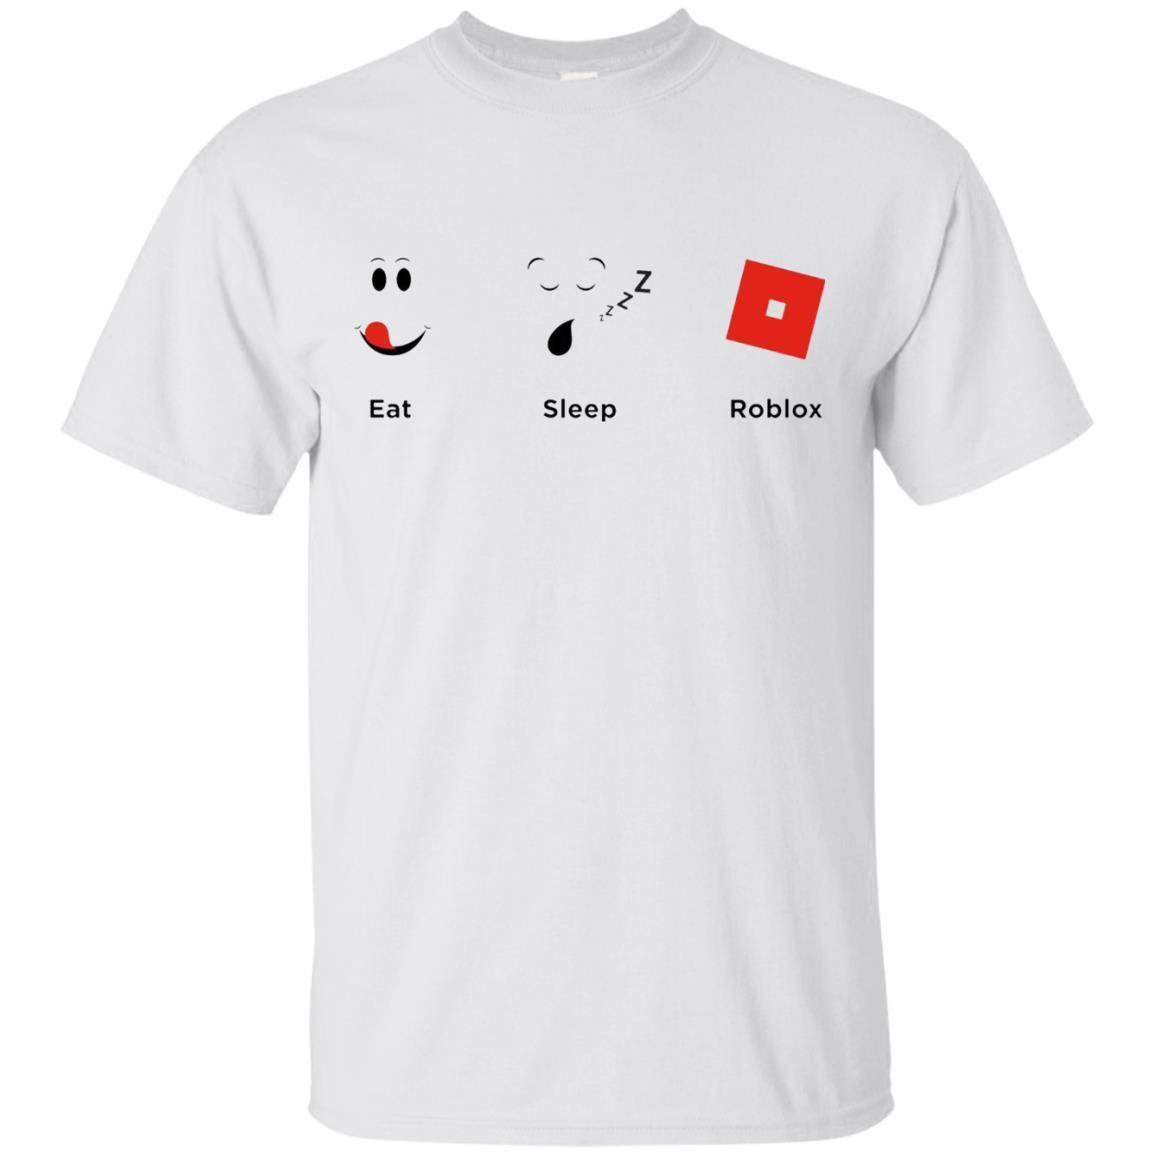 Eat. Sleep. Roblox. T-shirt